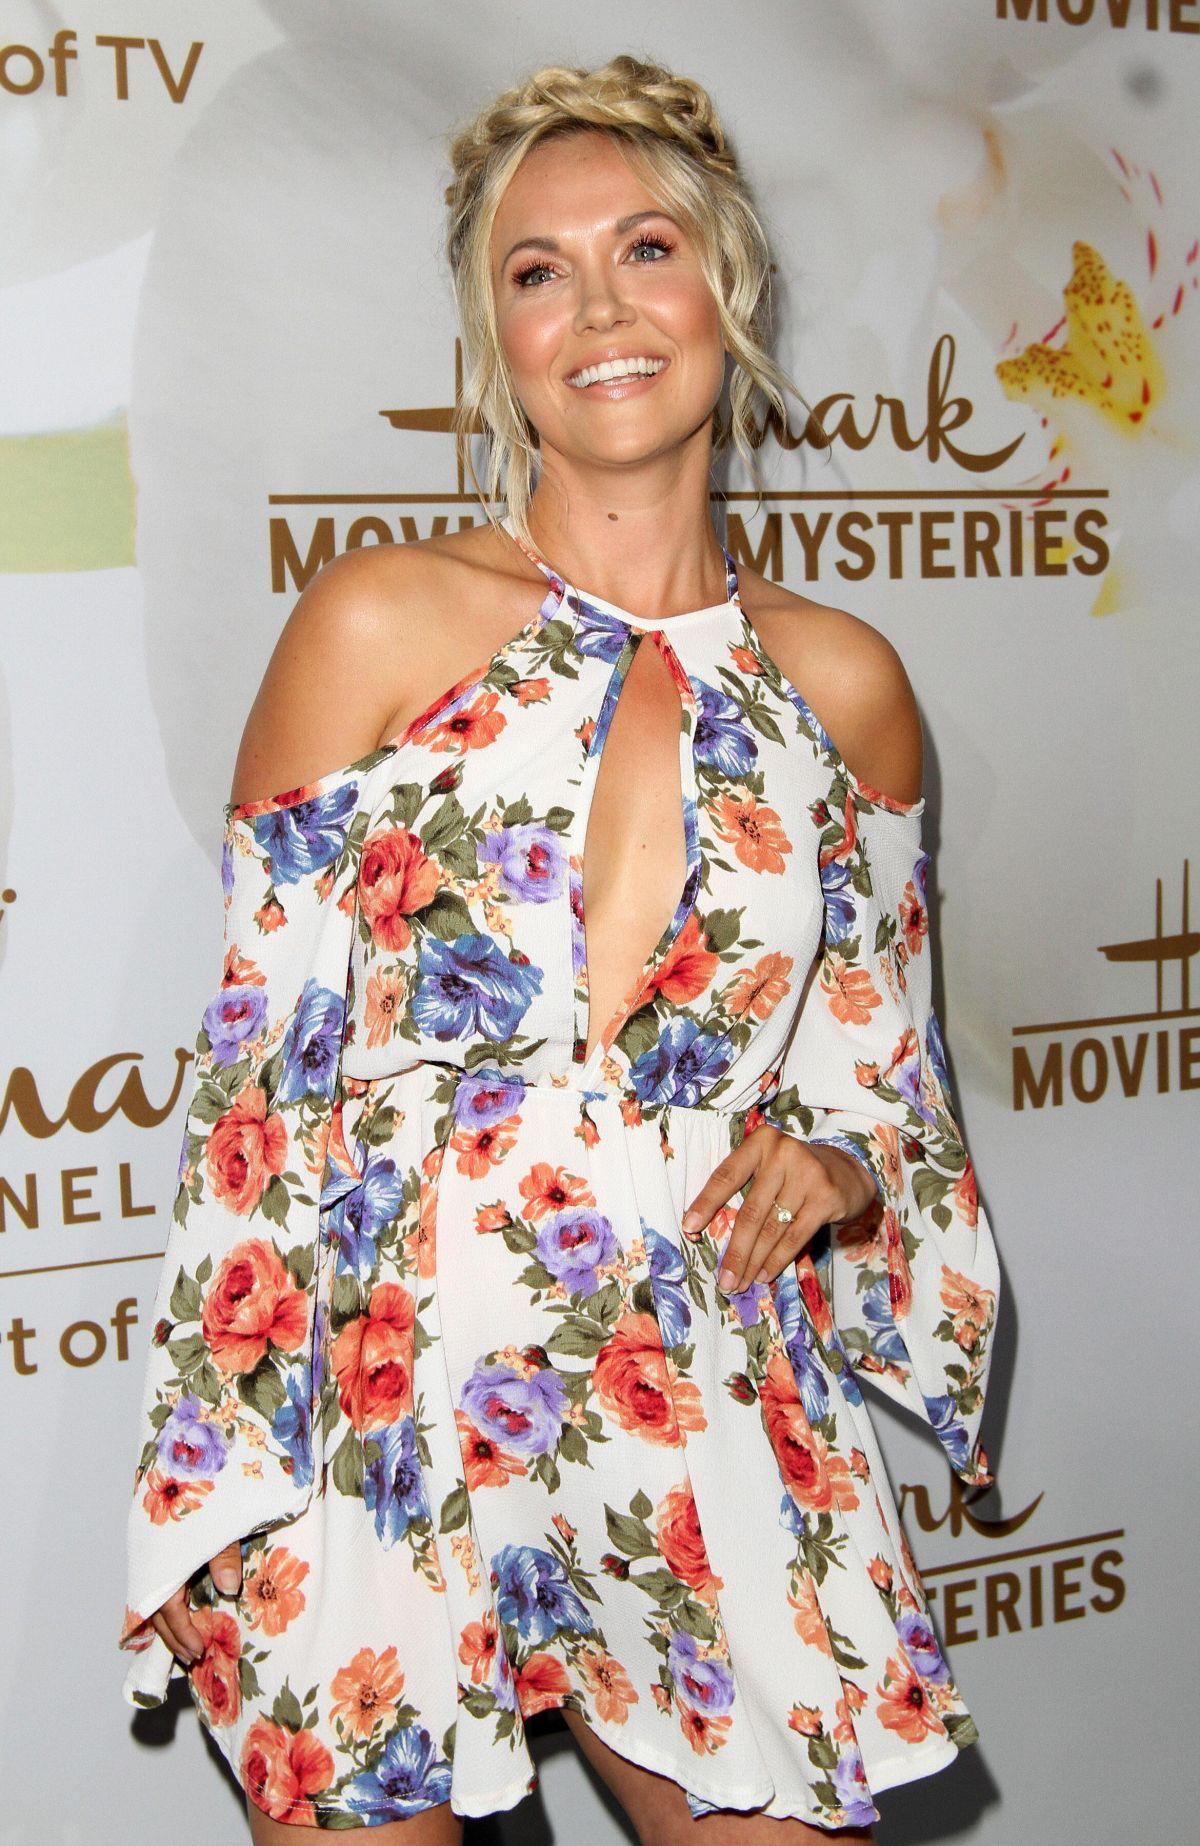 EMILIE ULLERUP at Hallmark Event TCA Summer Tour in Los Angeles 07/27/2017